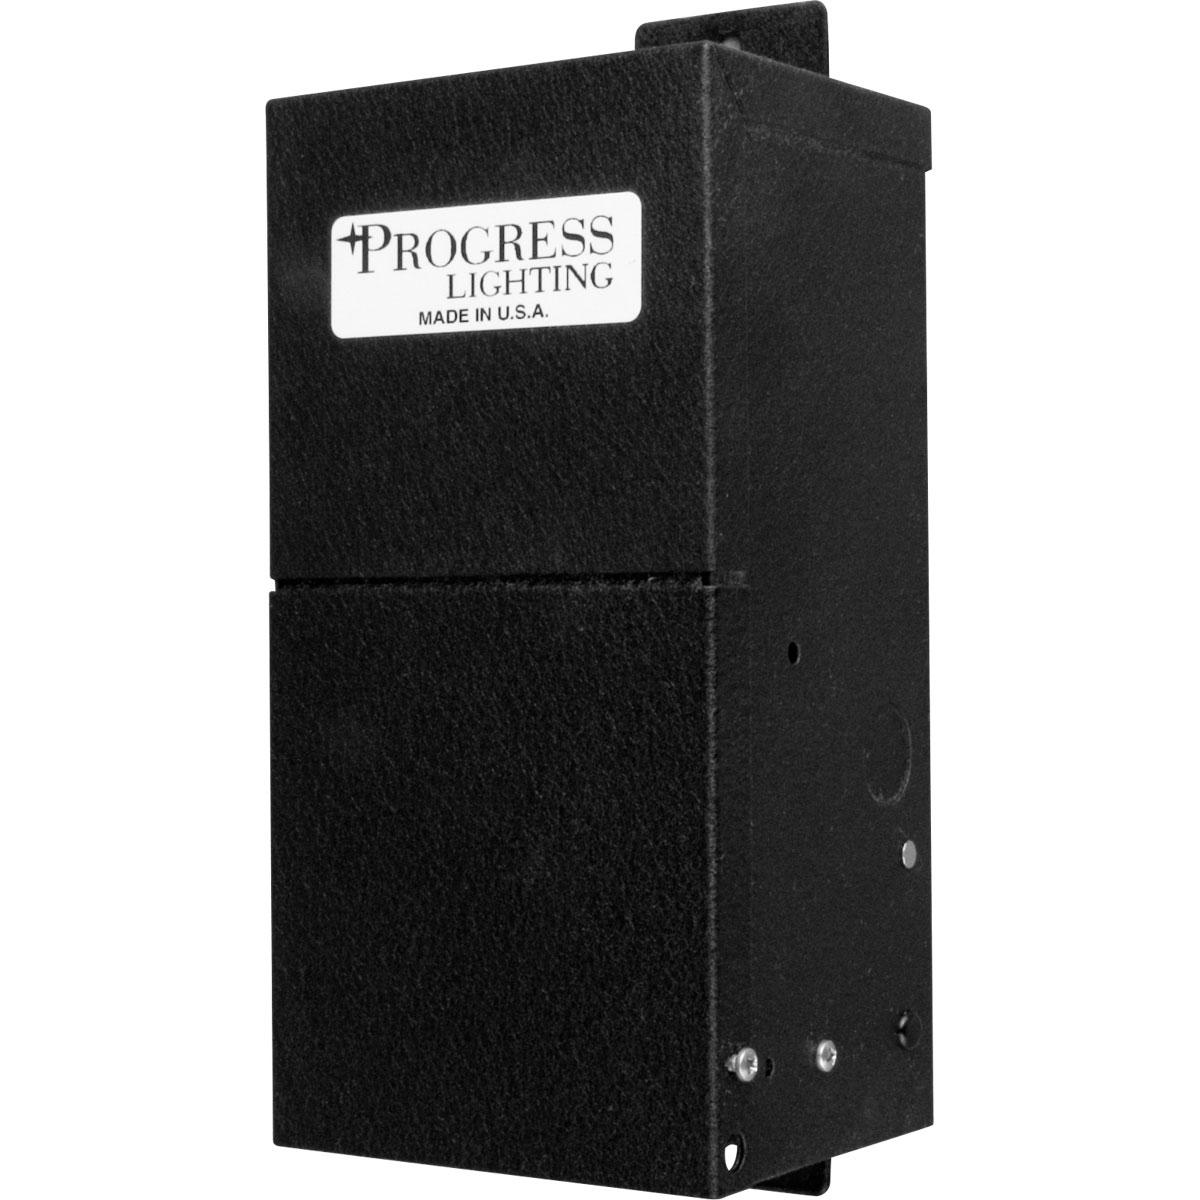 Progress Lighting® P8654-31 Commodity/Utilitarian Landscape Transformer, 120 VAC Input, 12 VAC Output, 300 W